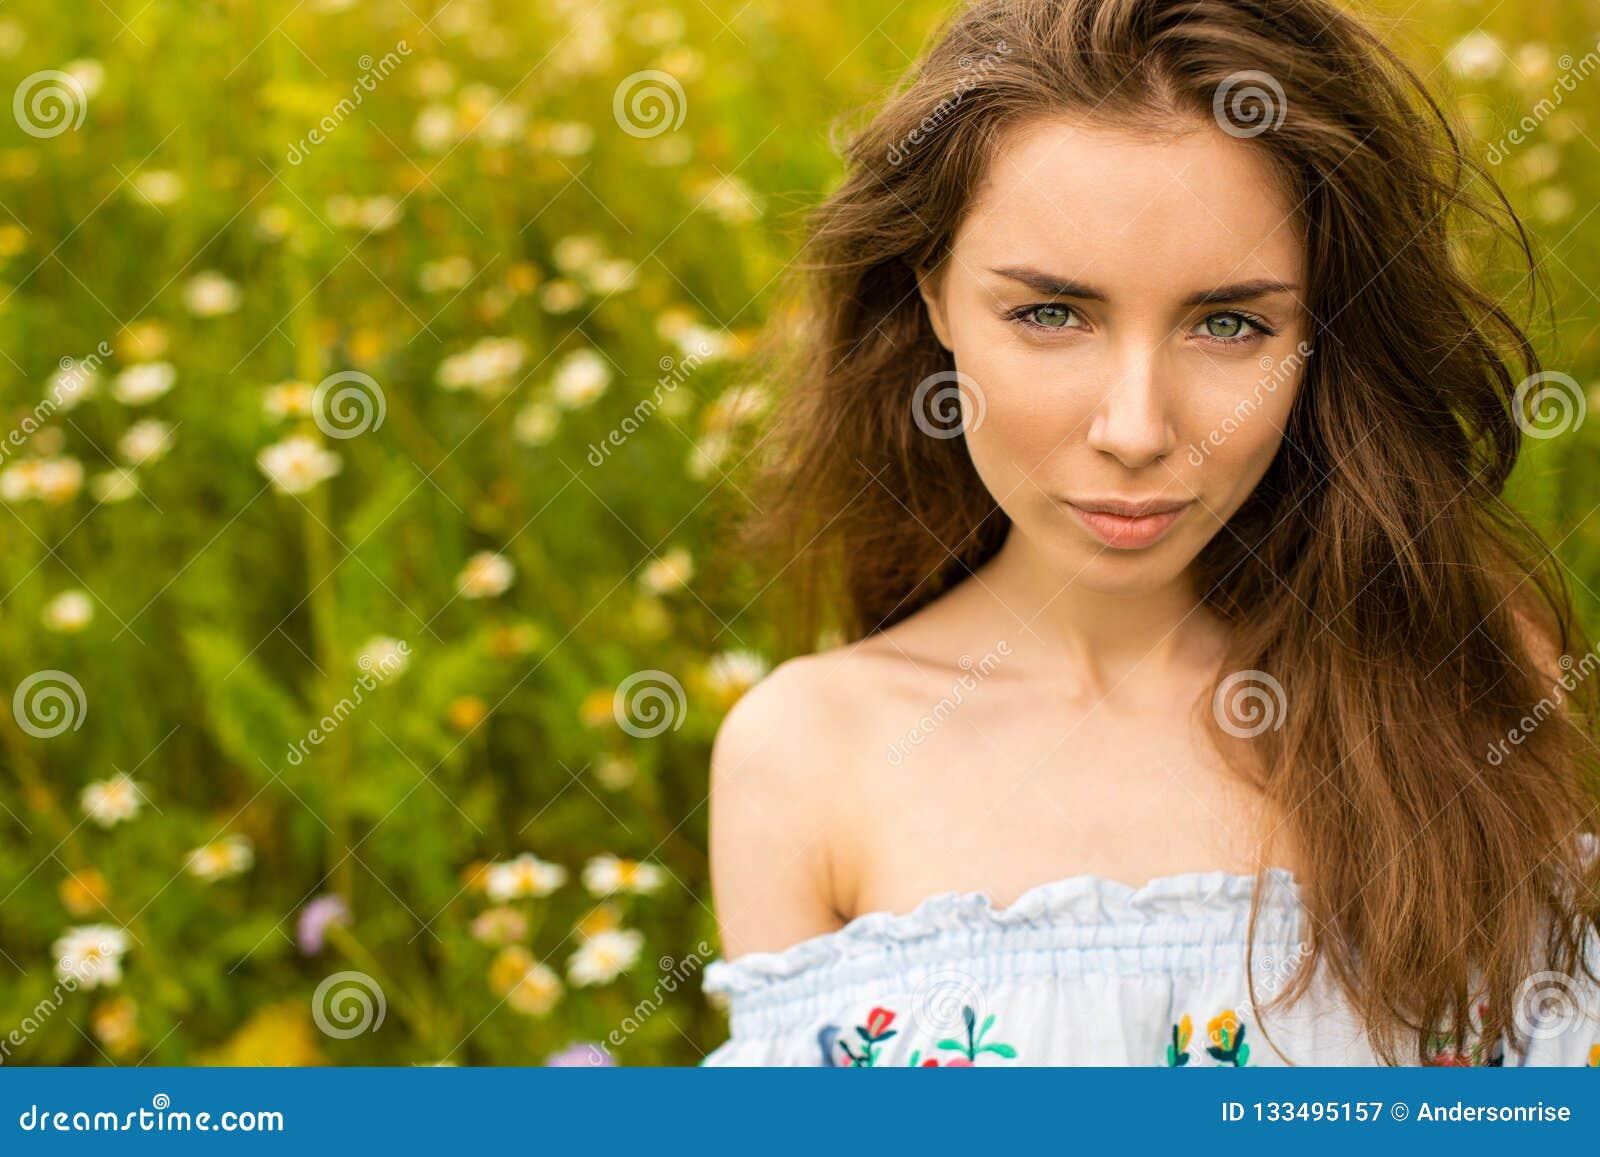 Photo of pretty brunette woman in chamomile field